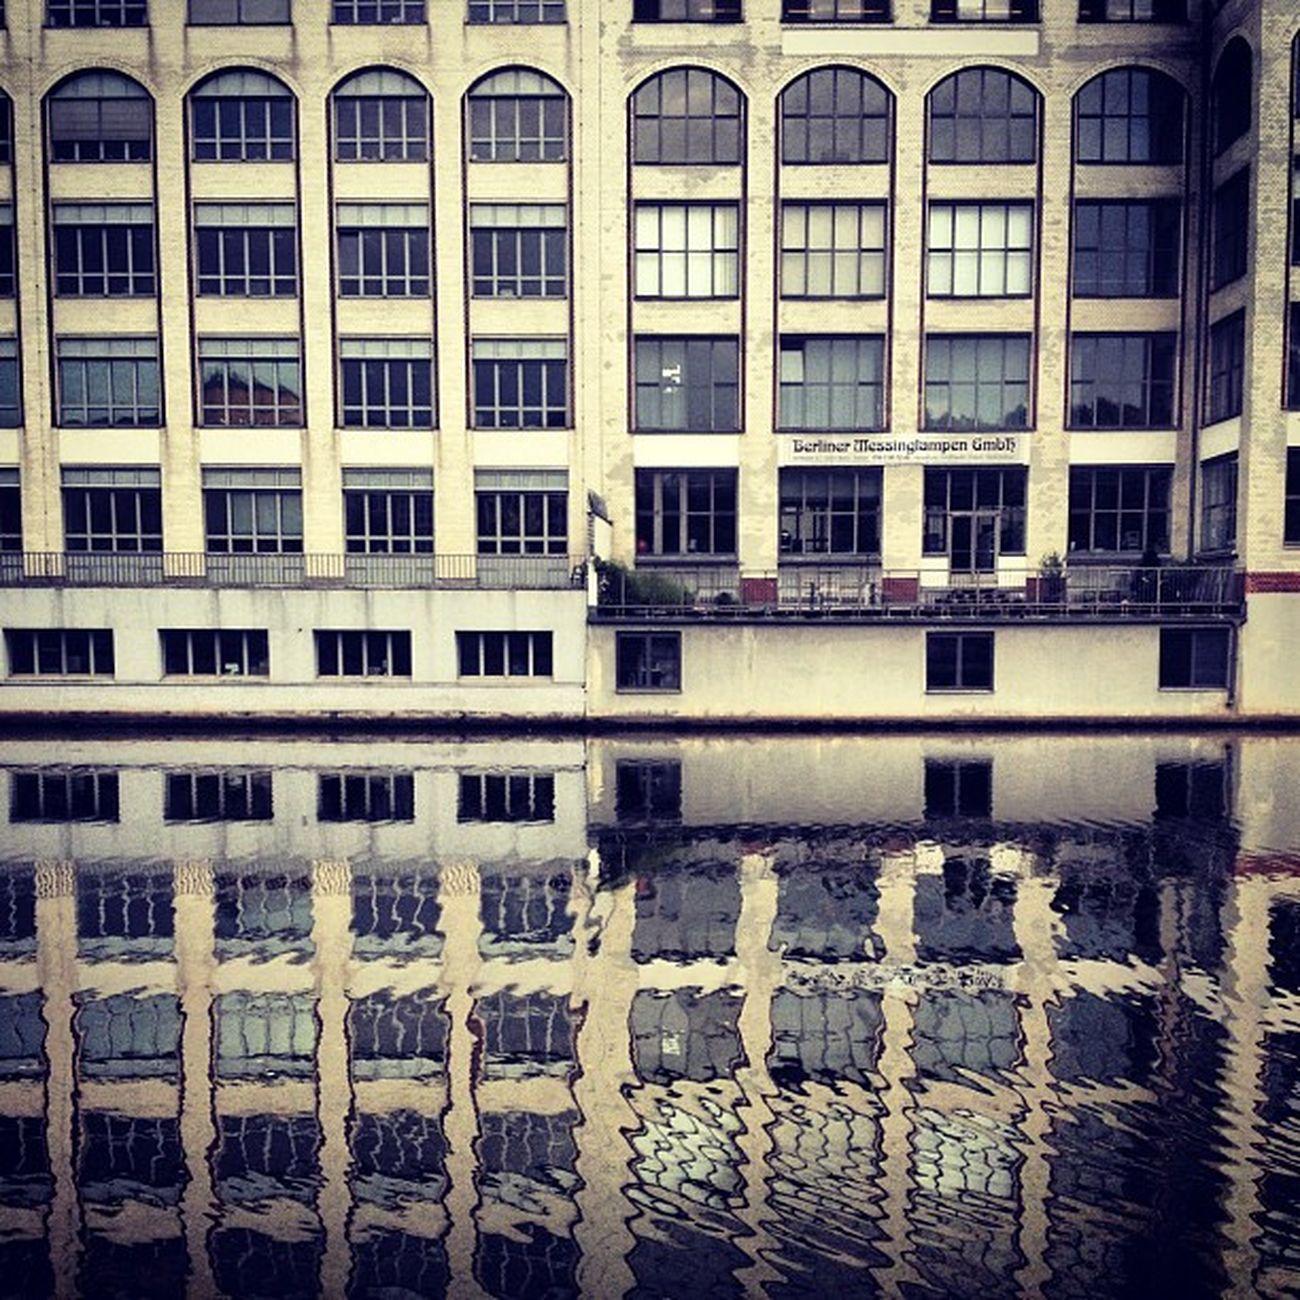 #architecture #Berlin #igersberlin #instagood #tweegram #photooftheday #follow #instamod #igers #picoftheday #instragamhub #instadaily #insta_germany #bestoftheday #igdaily #webstagram #instragramers #ig_special #igersberlin #gf_germany #all_shots #mirror Bestoftheday Igers IGDaily Tweegram Instagood Webstagram Instadaily Igersberlin Architecture Insta_germany Berlin Gf_germany Spiegelung Instragramers Mirror Ig_special Photooftheday Instragamhub Picoftheday Instamod Follow All_shots